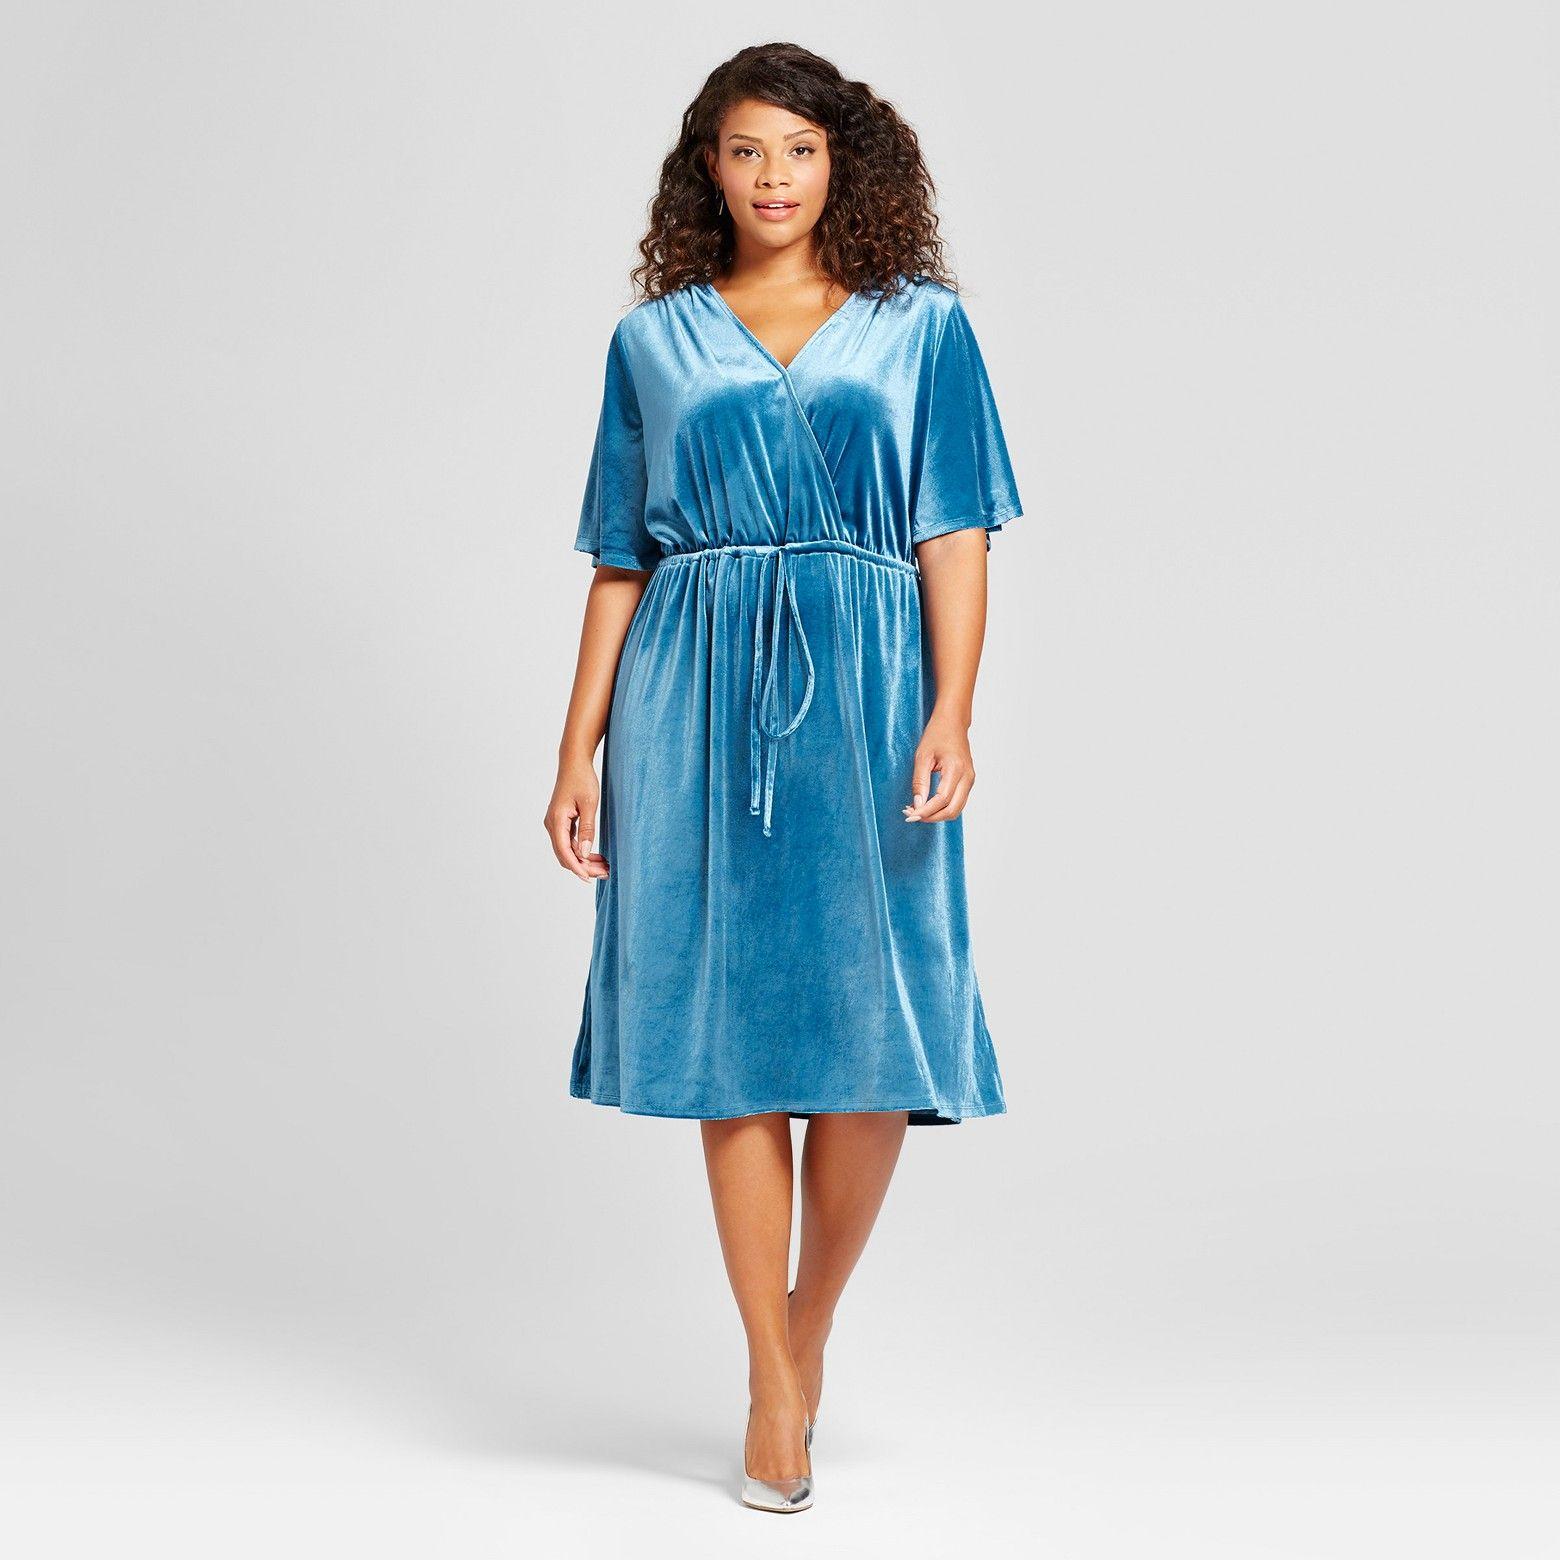 Ava & Viv Women\'s Plus Size Velvet Wrap Dress | Wrap dresses, Wrap ...